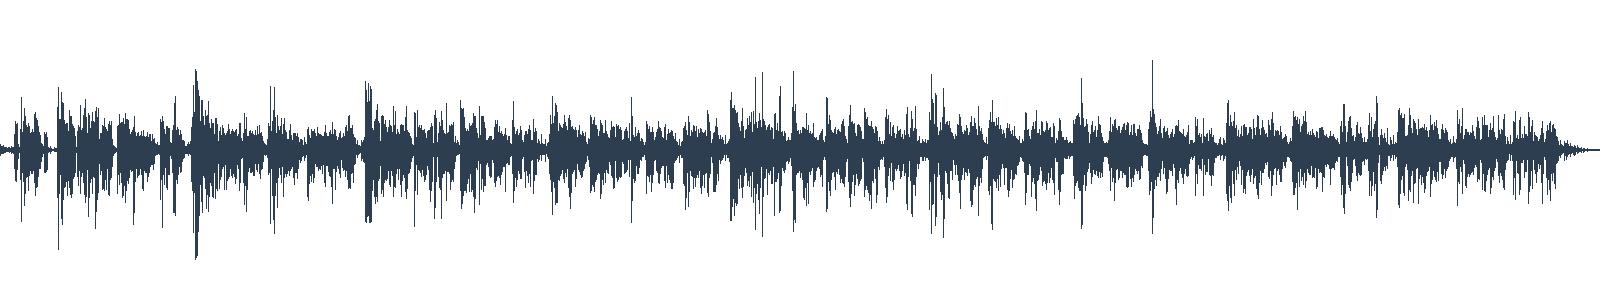 Nové audioknihy 15/2019 waveform